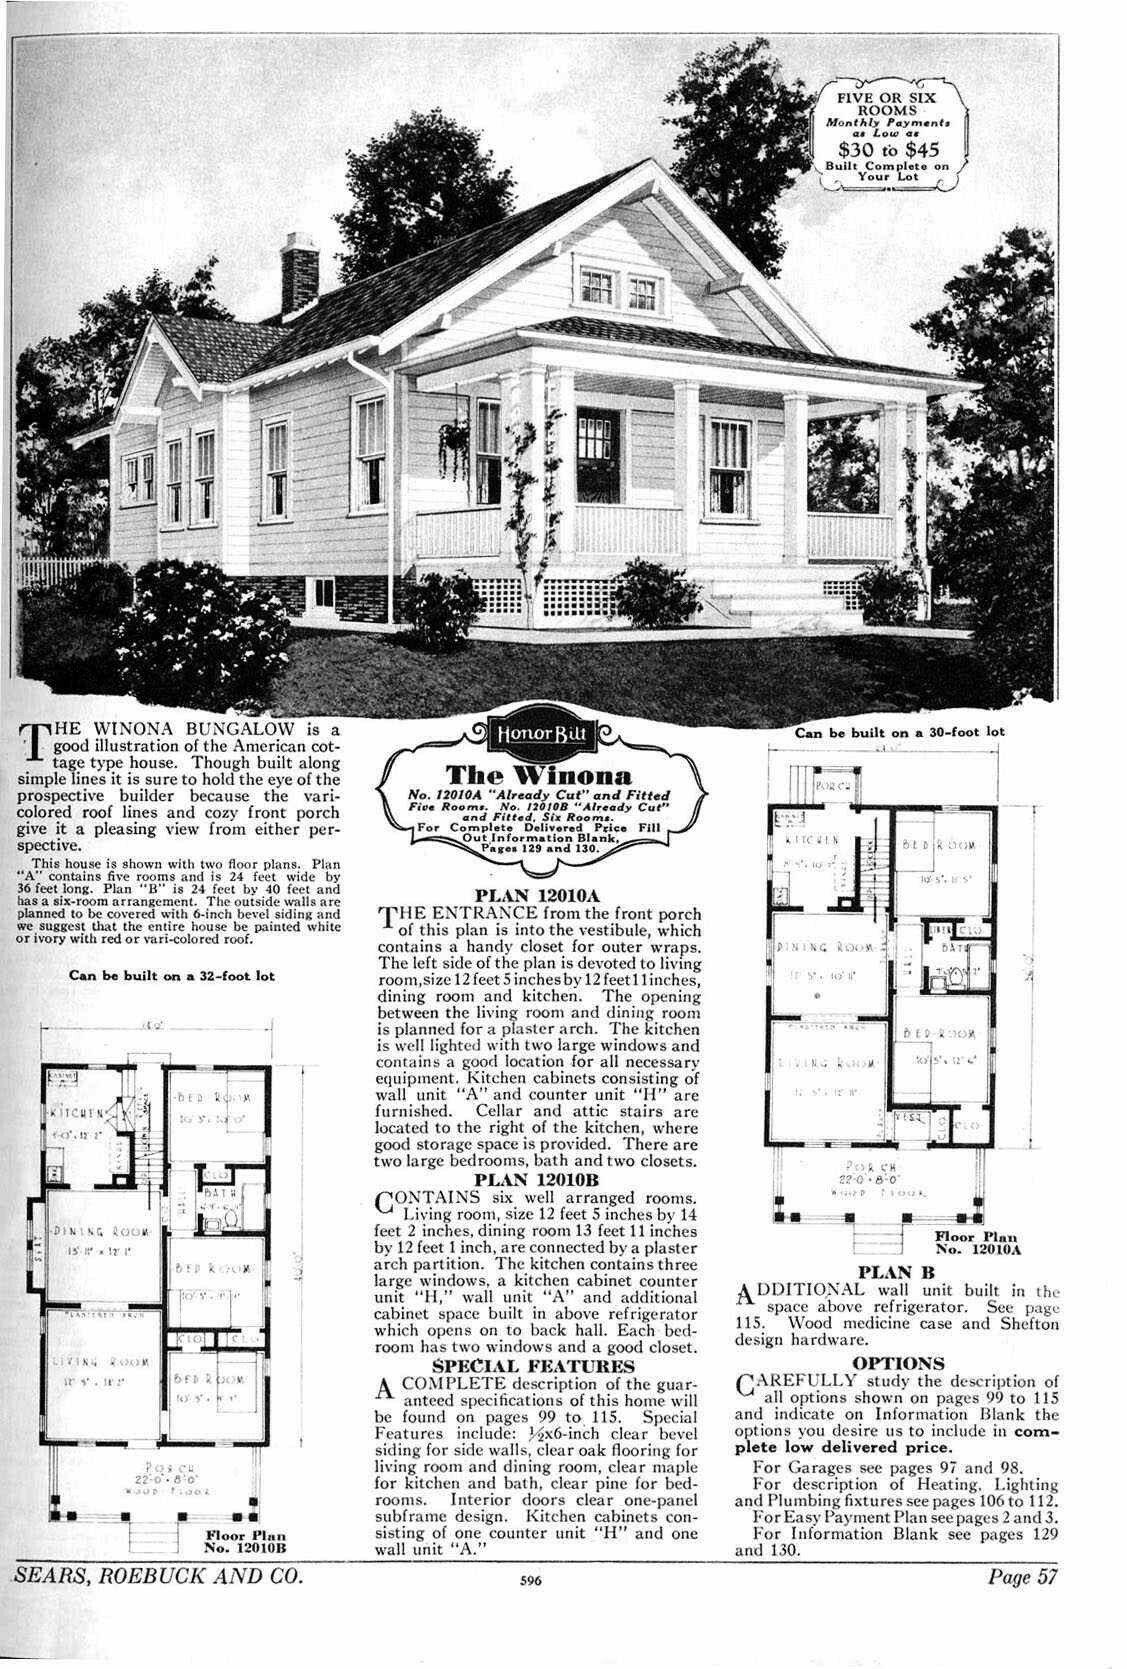 House Plans 1910 S Sears Homes Nostalgia Bungalow Floor Plans Craftsman House Plans Victorian House Plans